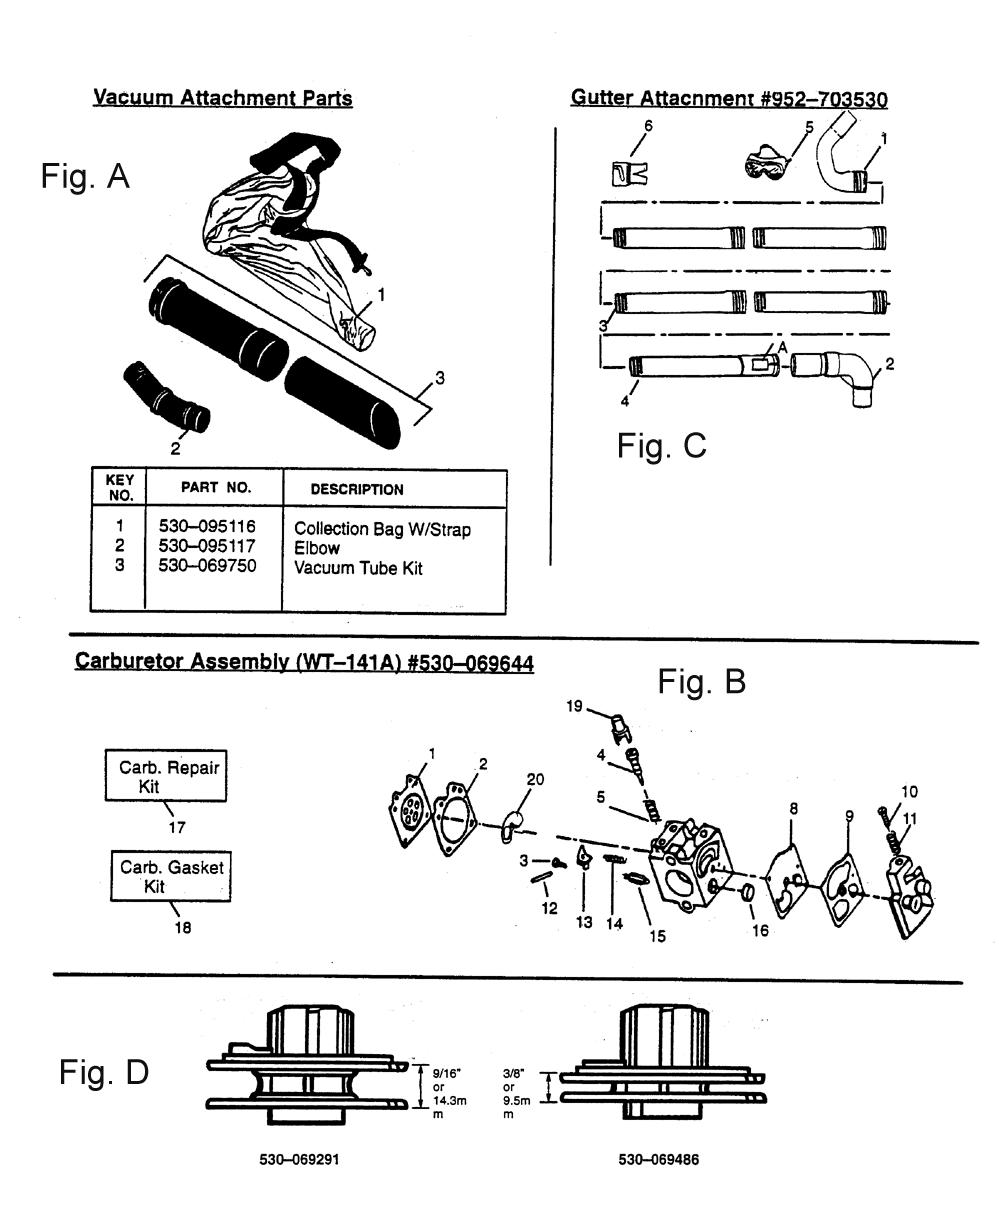 132HBV-T1-Husqvarna-PB-2Break Down